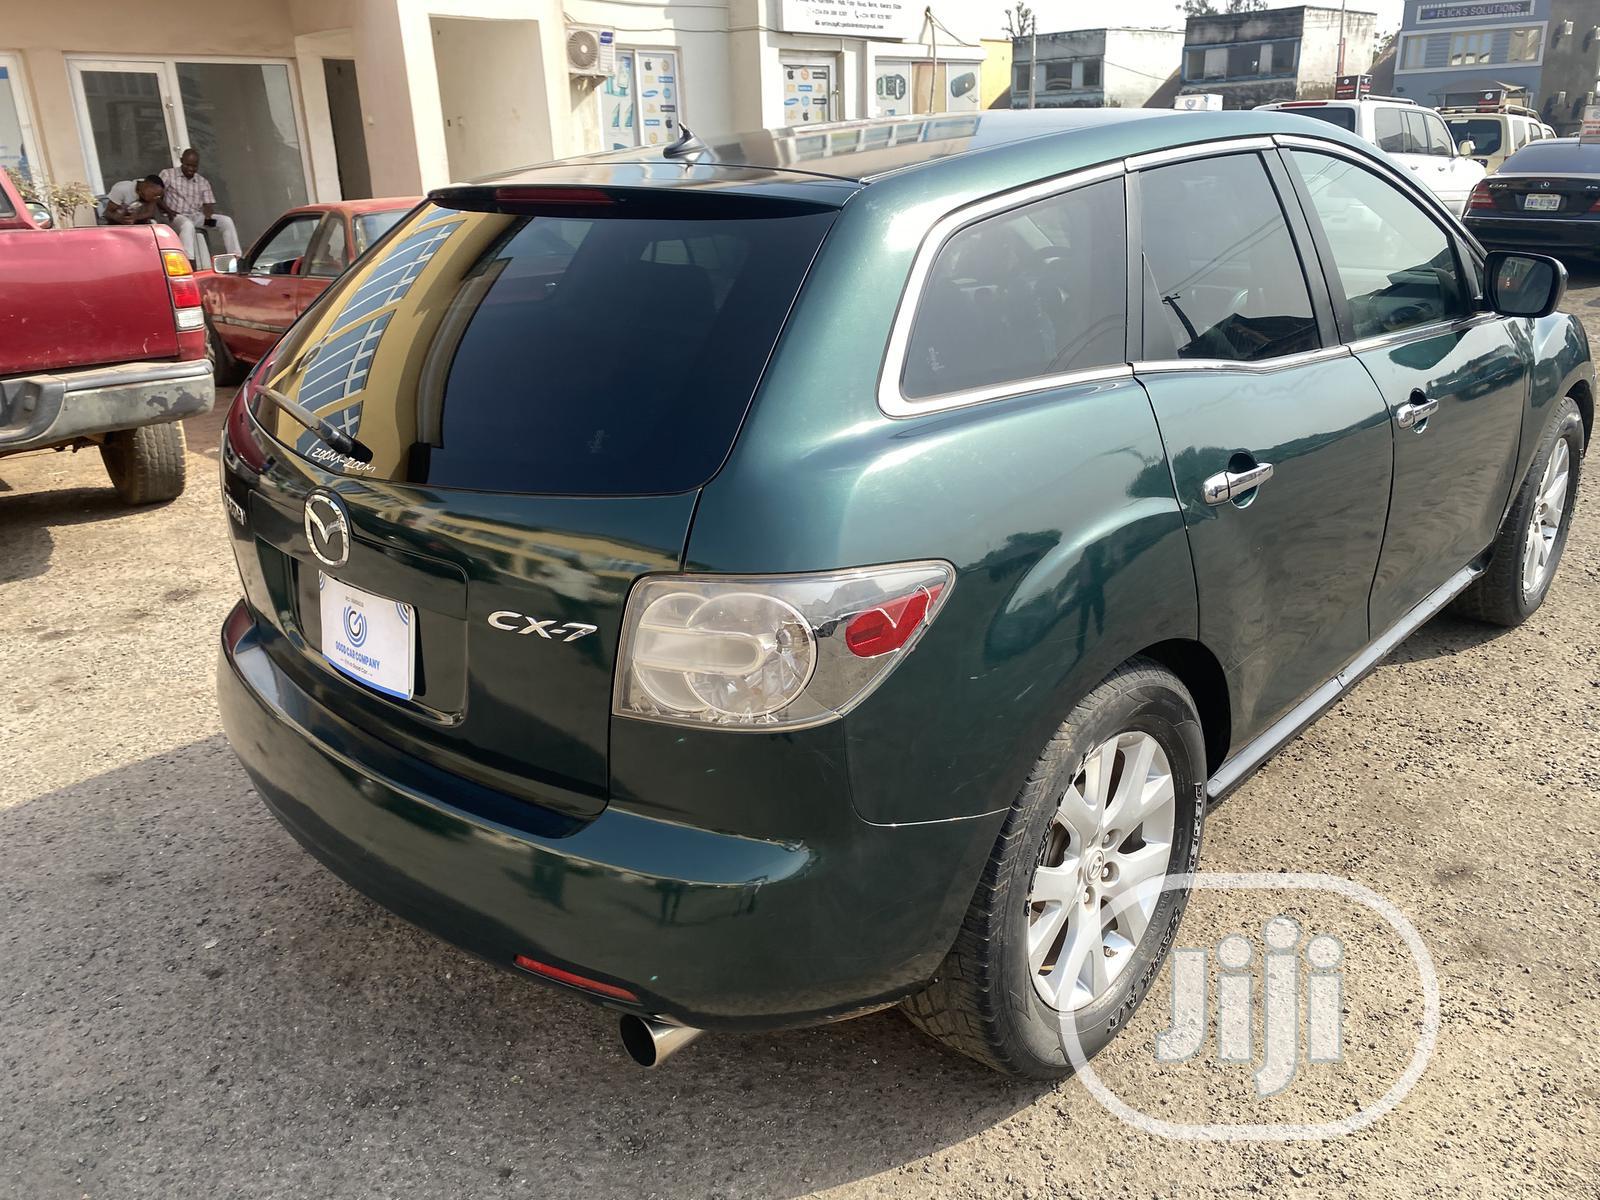 Mazda CX-7 2006 Green | Cars for sale in Ilorin South, Kwara State, Nigeria